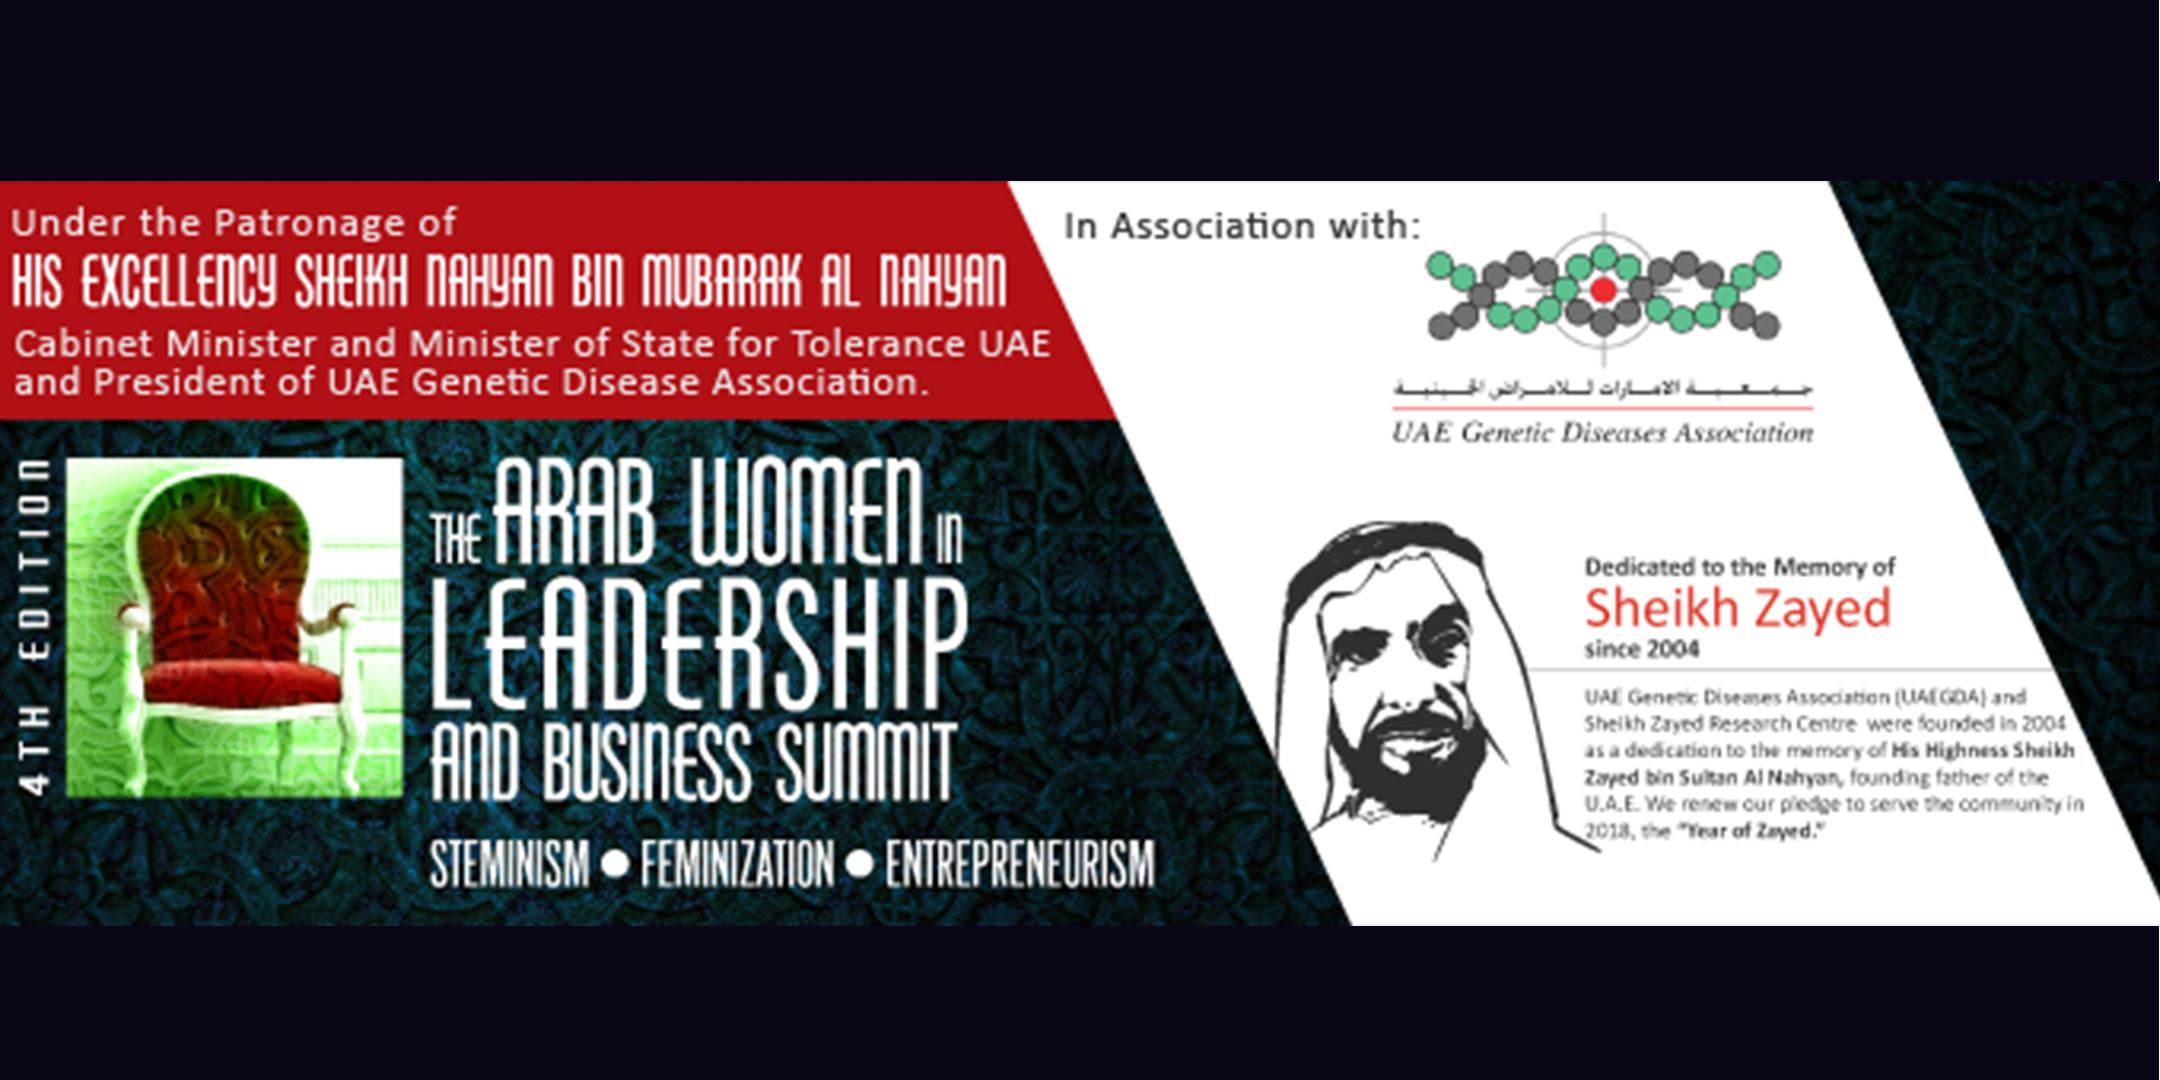 Arab Women in Leadership and Business Summit : 4th Edition, Dubai, United Arab Emirates